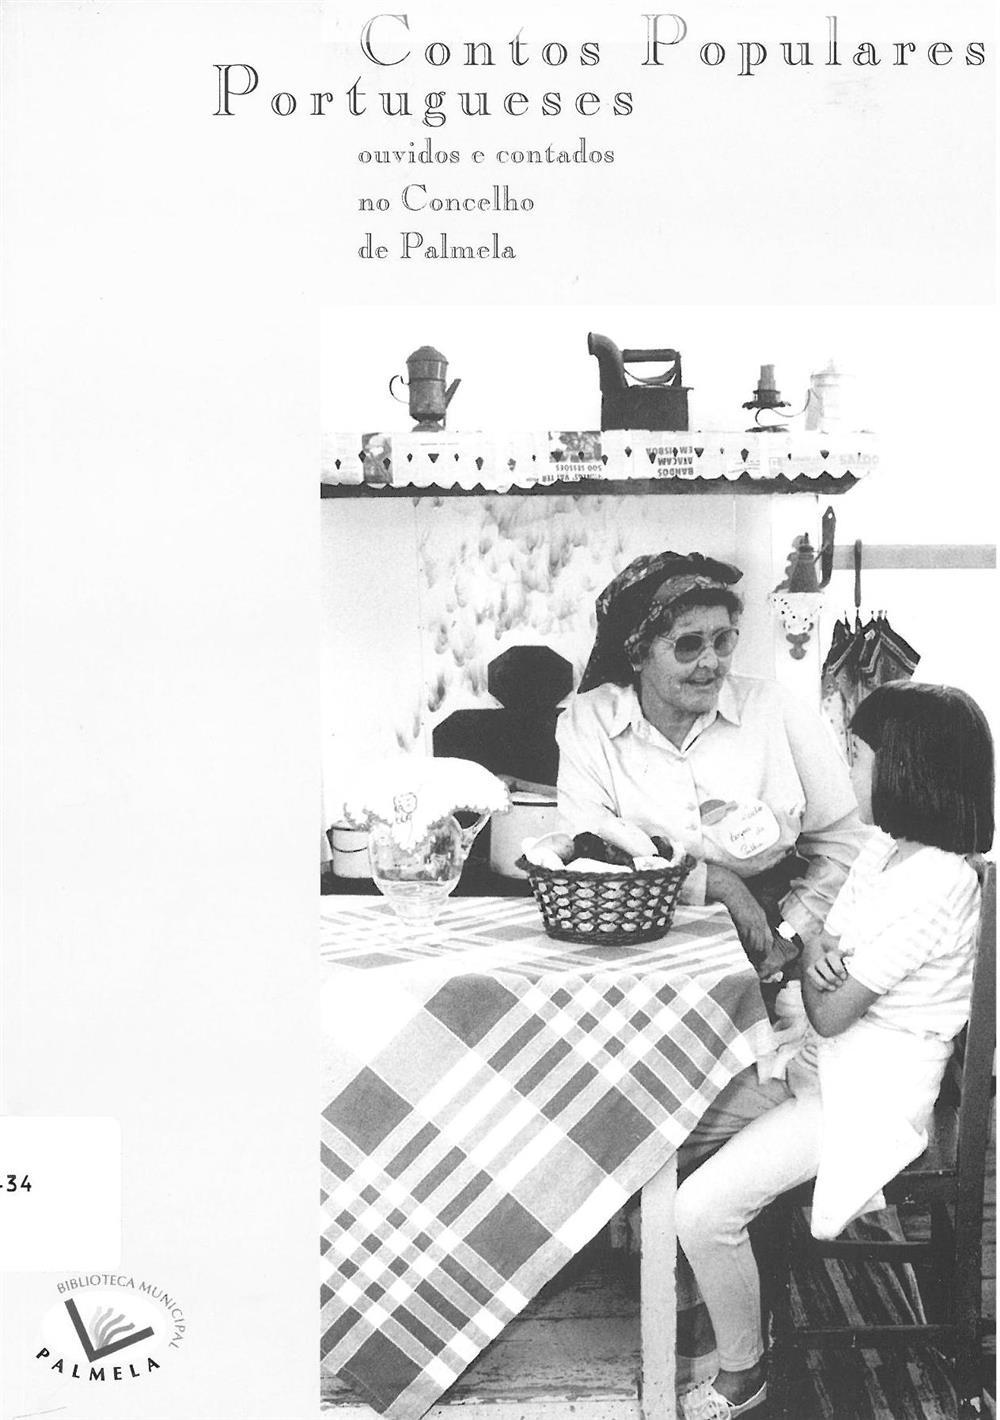 Contos populares portugueses_.jpg